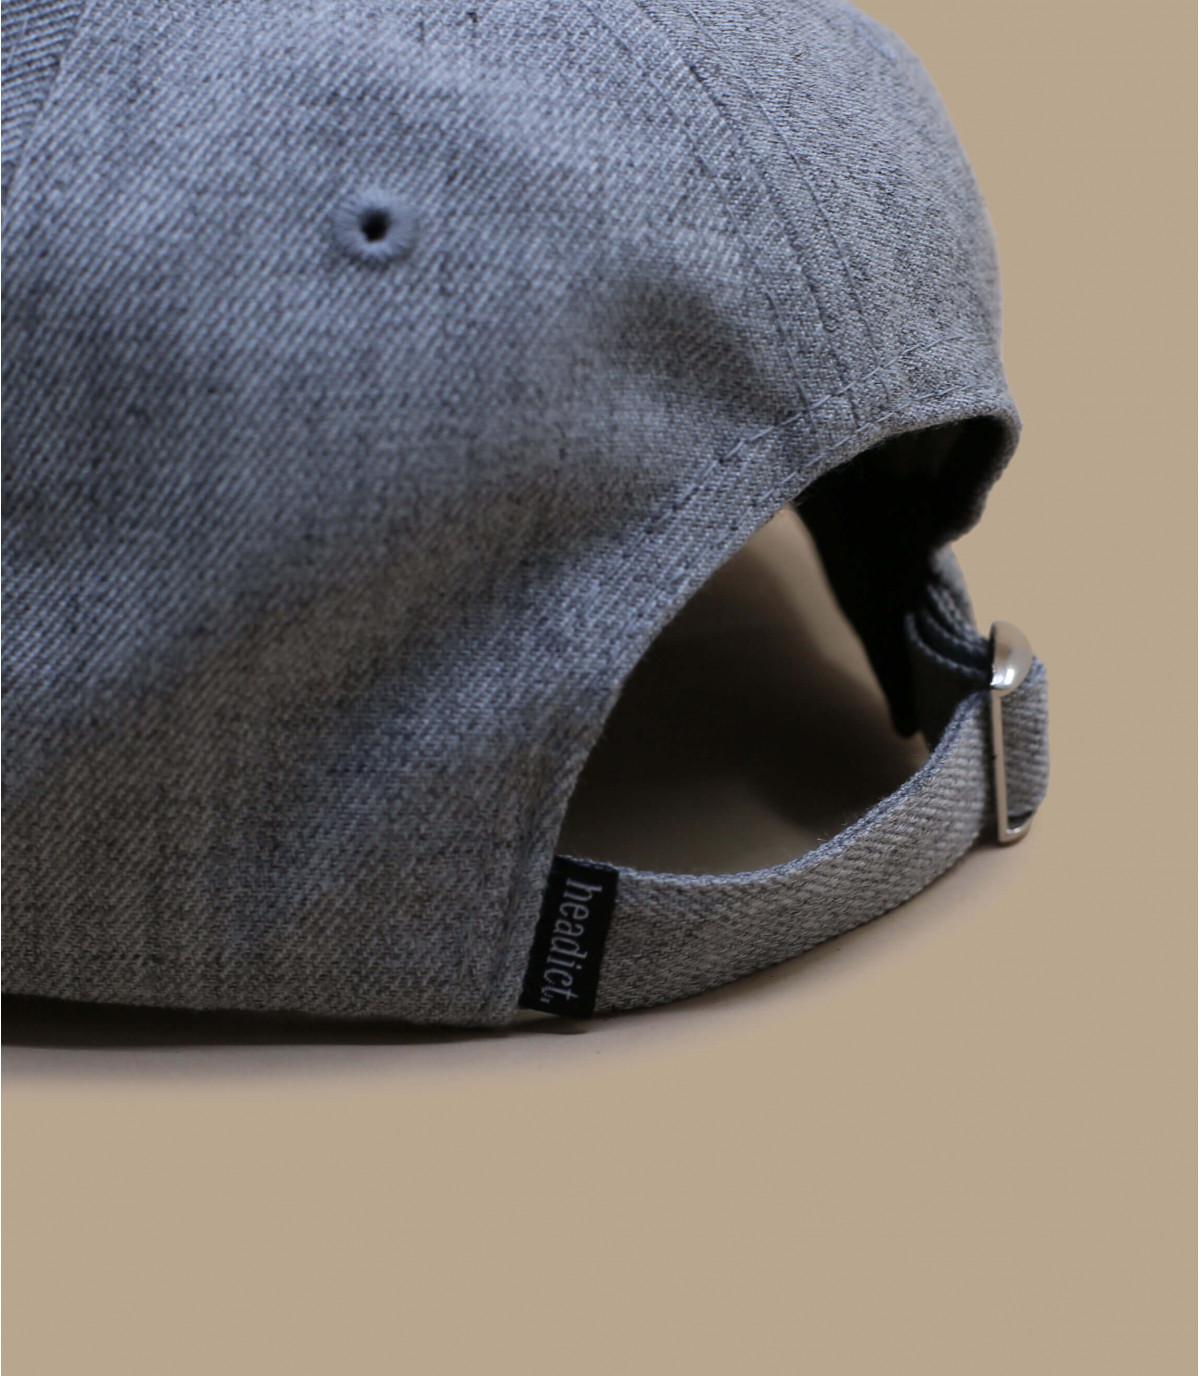 Details Curve Cloned To Kill grey - Abbildung 4